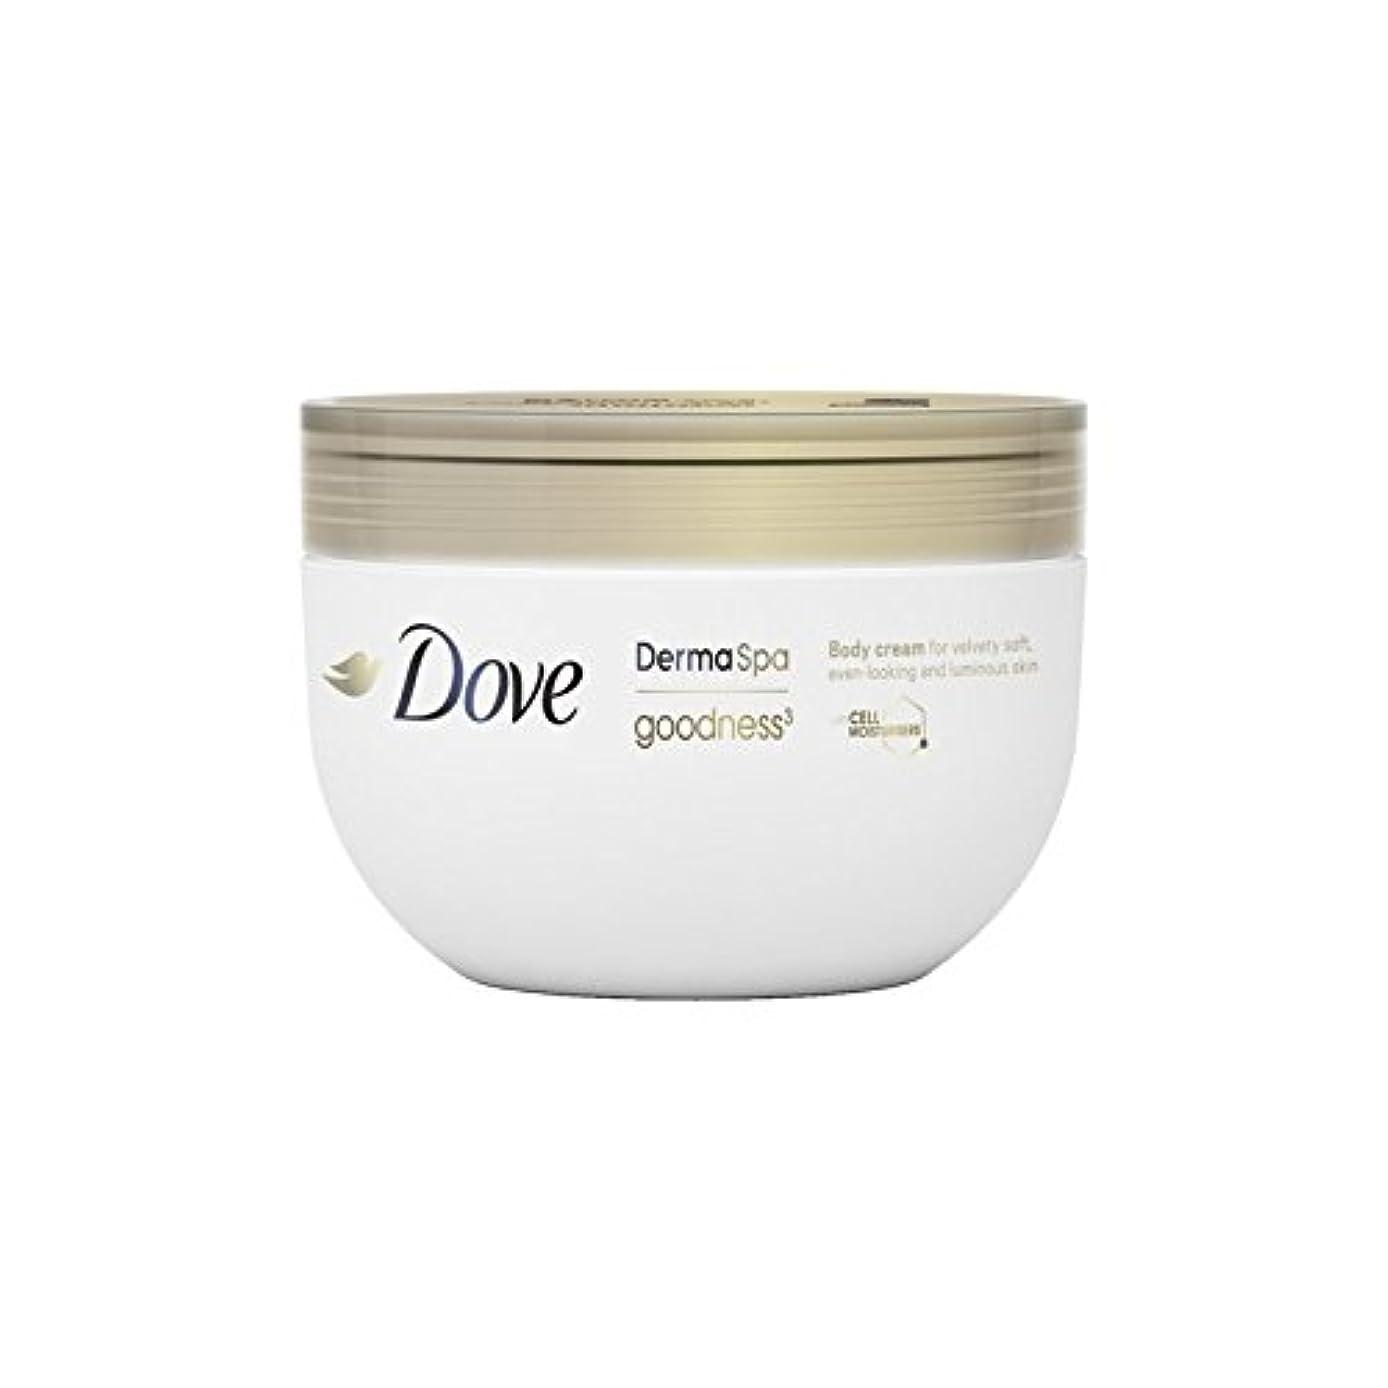 Dove DermaSpa Goodness3 Body Cream (300ml) (Pack of 6) - 鳩の3ボディクリーム(300ミリリットル) x6 [並行輸入品]